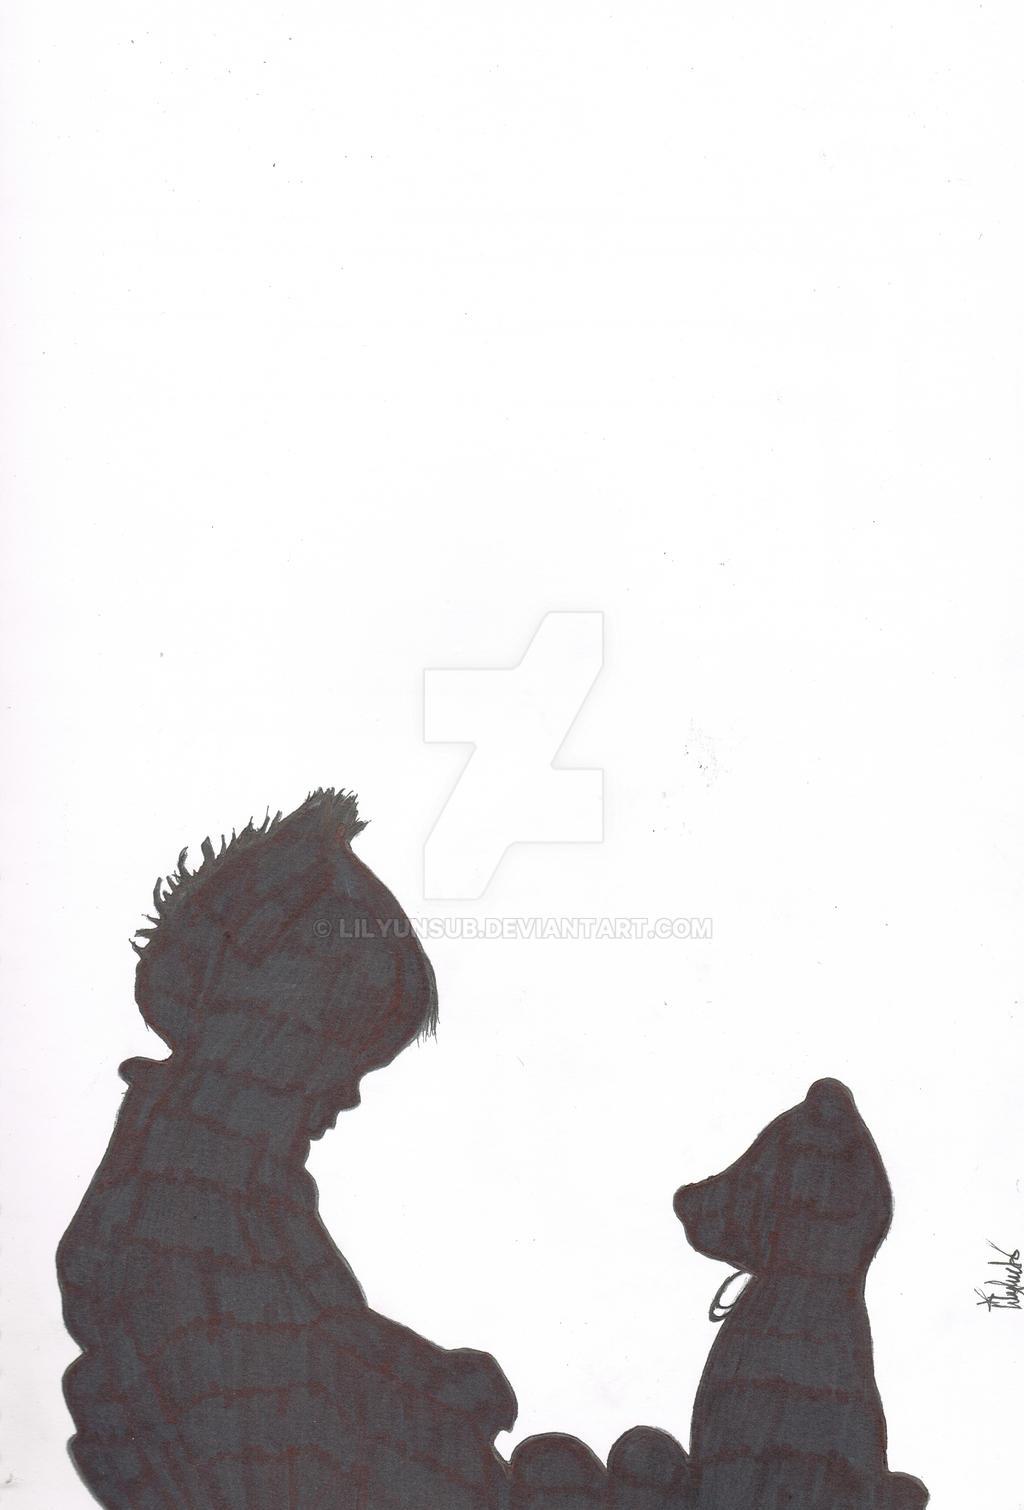 07-29-18 - Little Chief by LilyUnsub